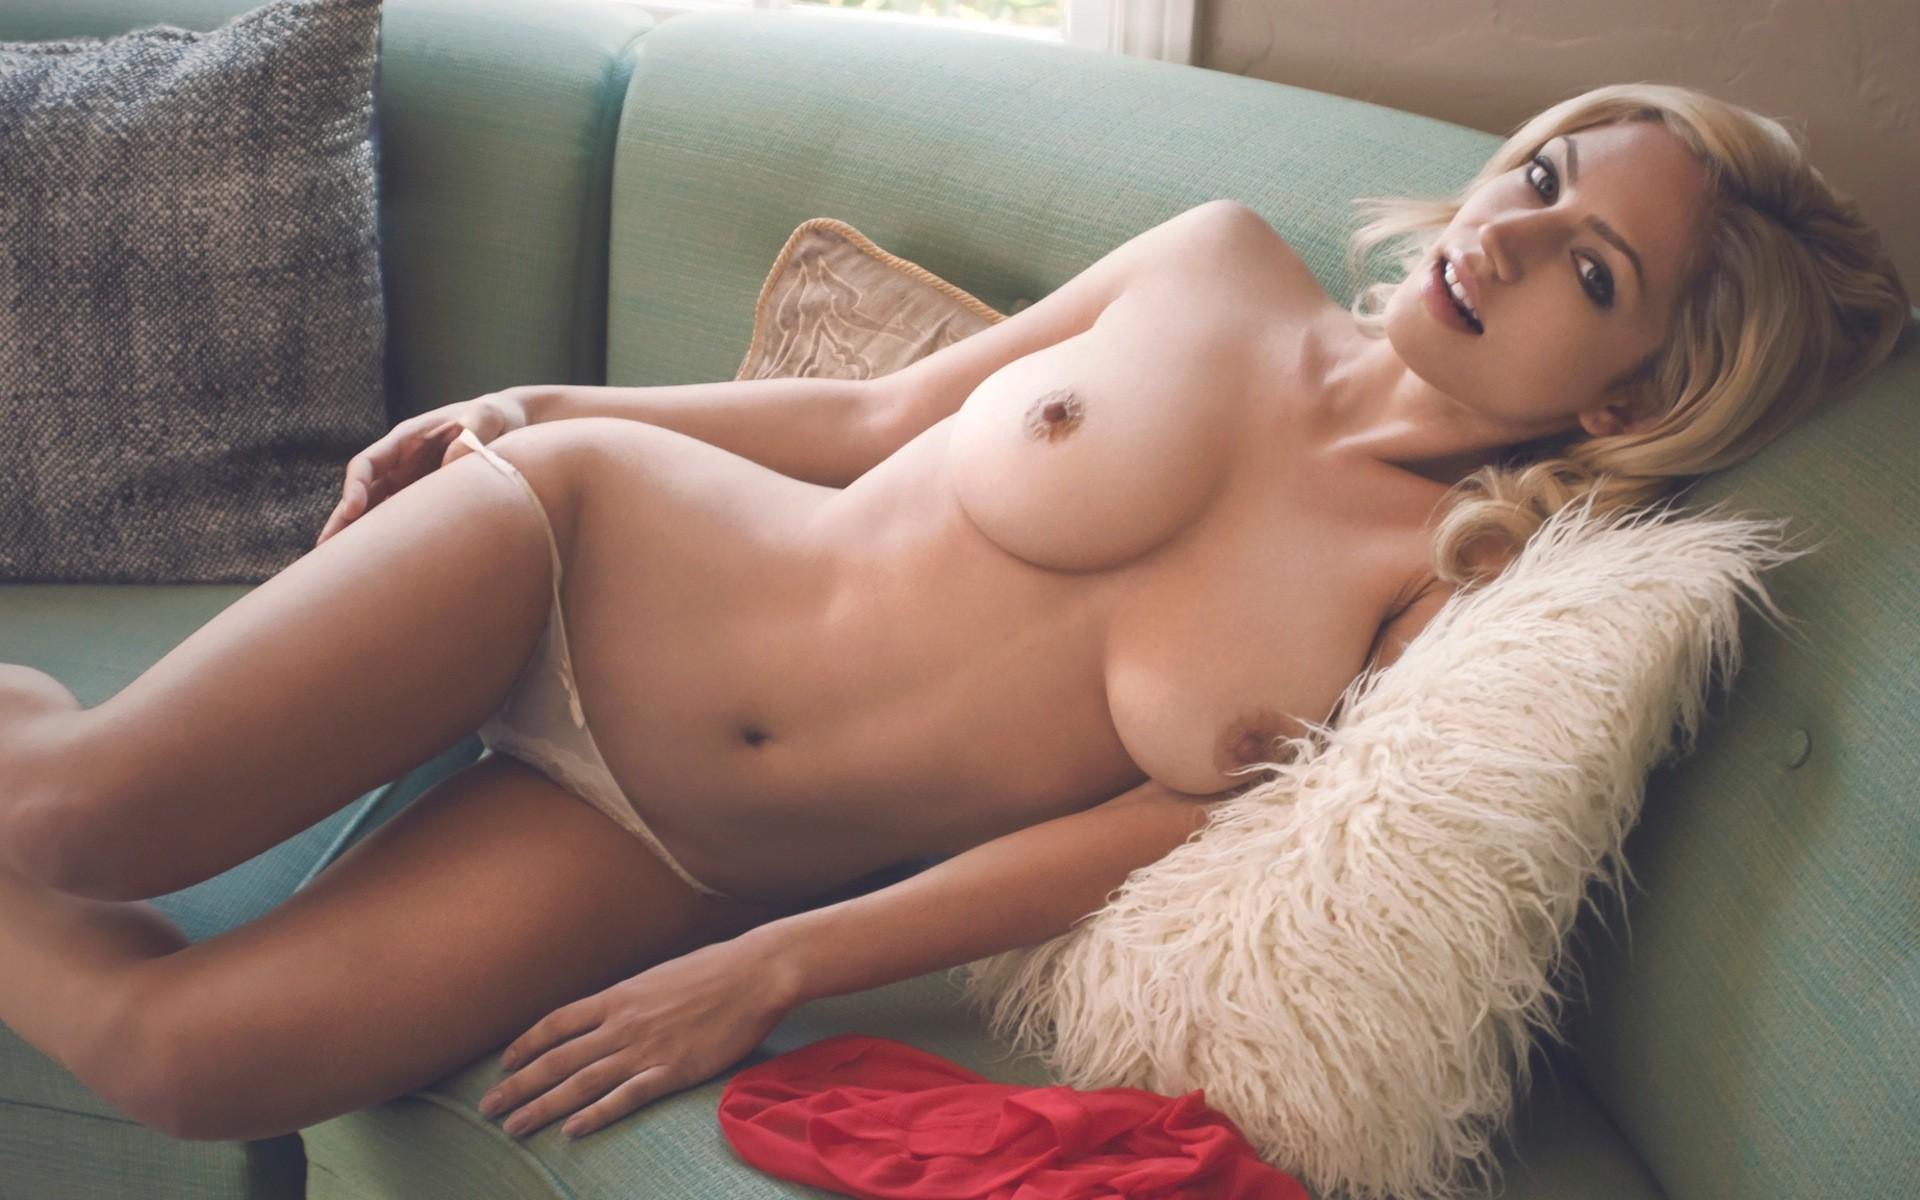 krasivie-golie-devushki-seks-foto